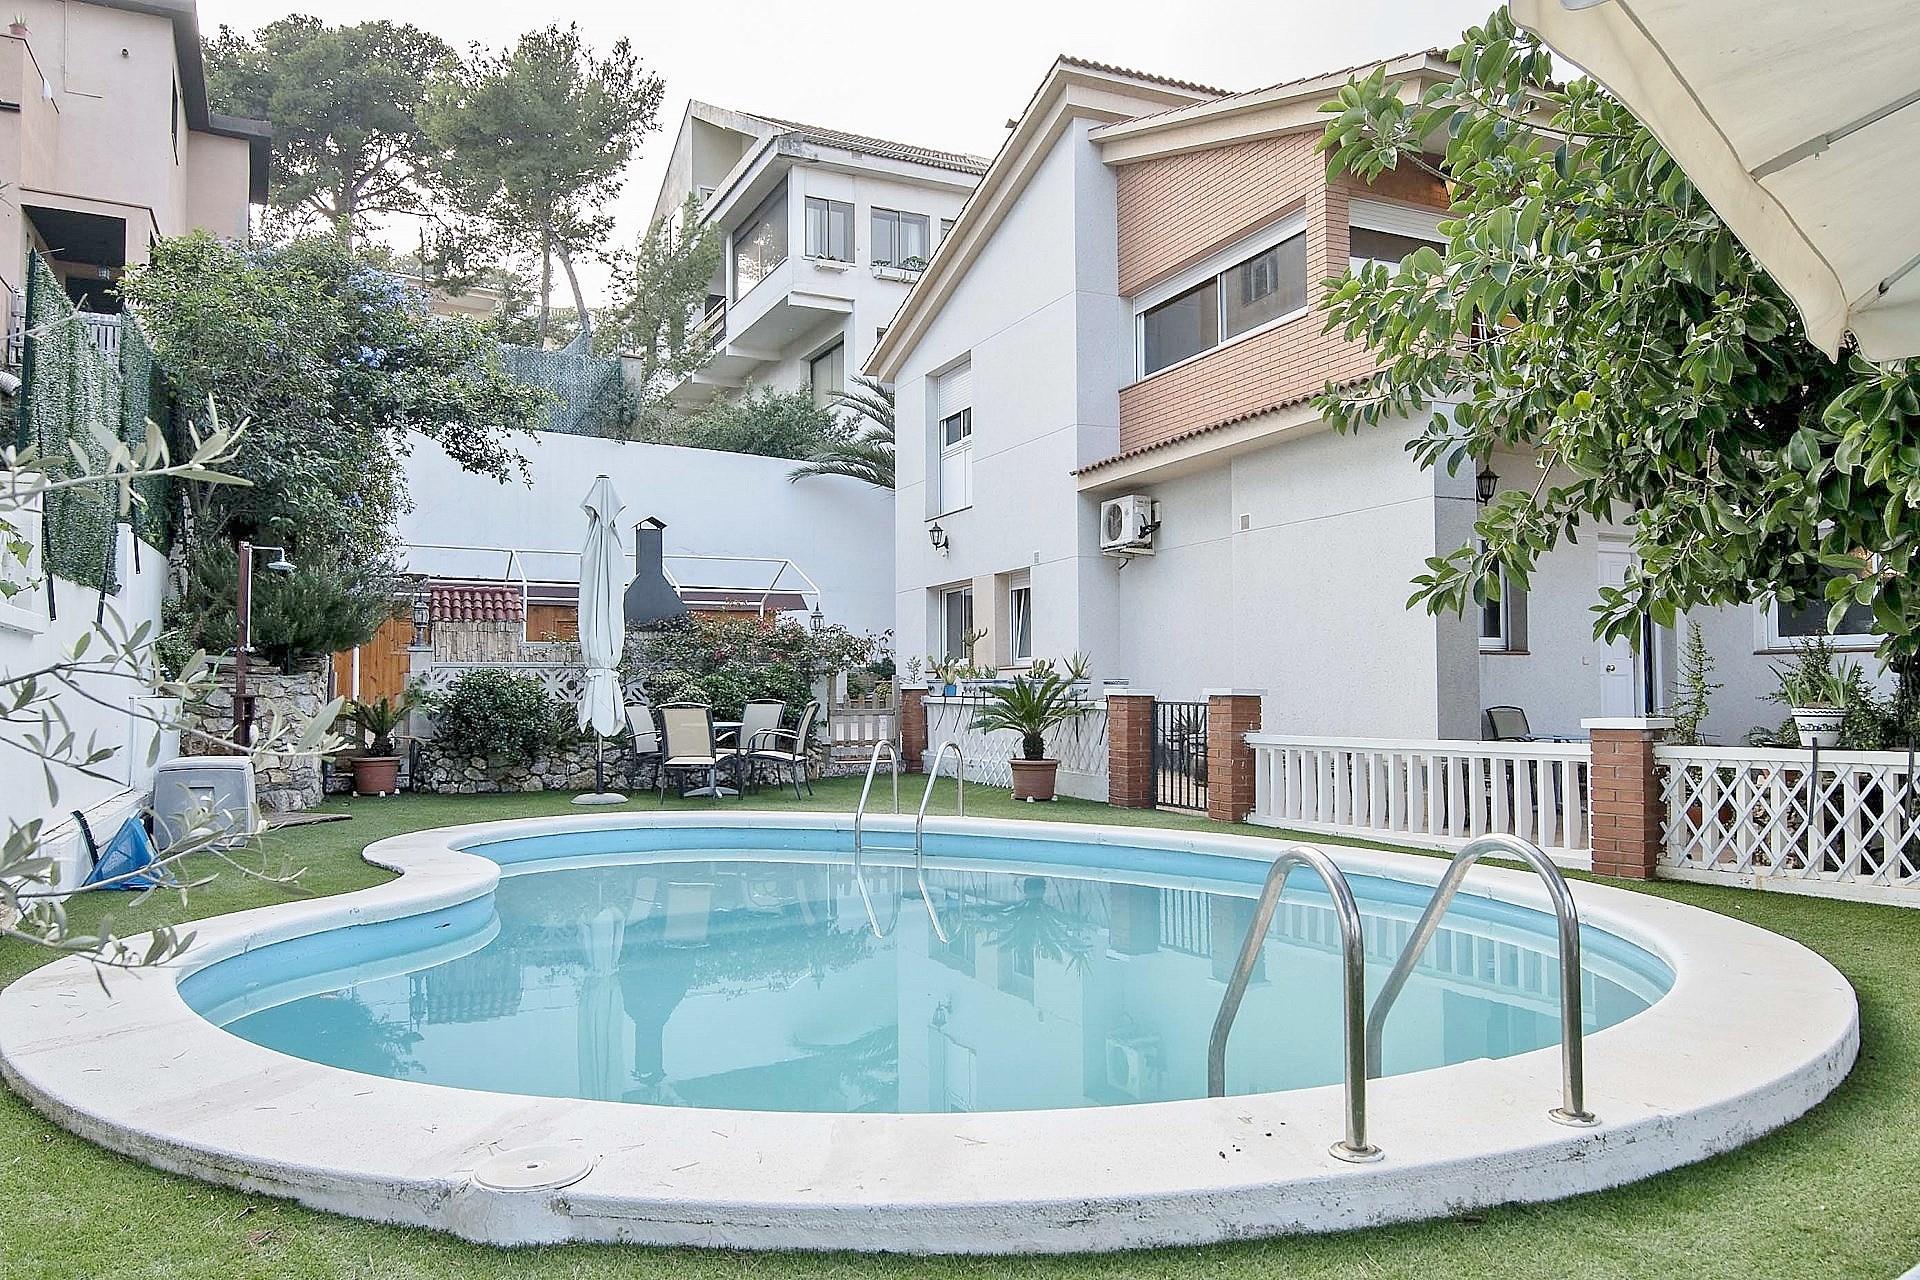 Casa espectacular en venta en Castelldefels de Barcelona ...